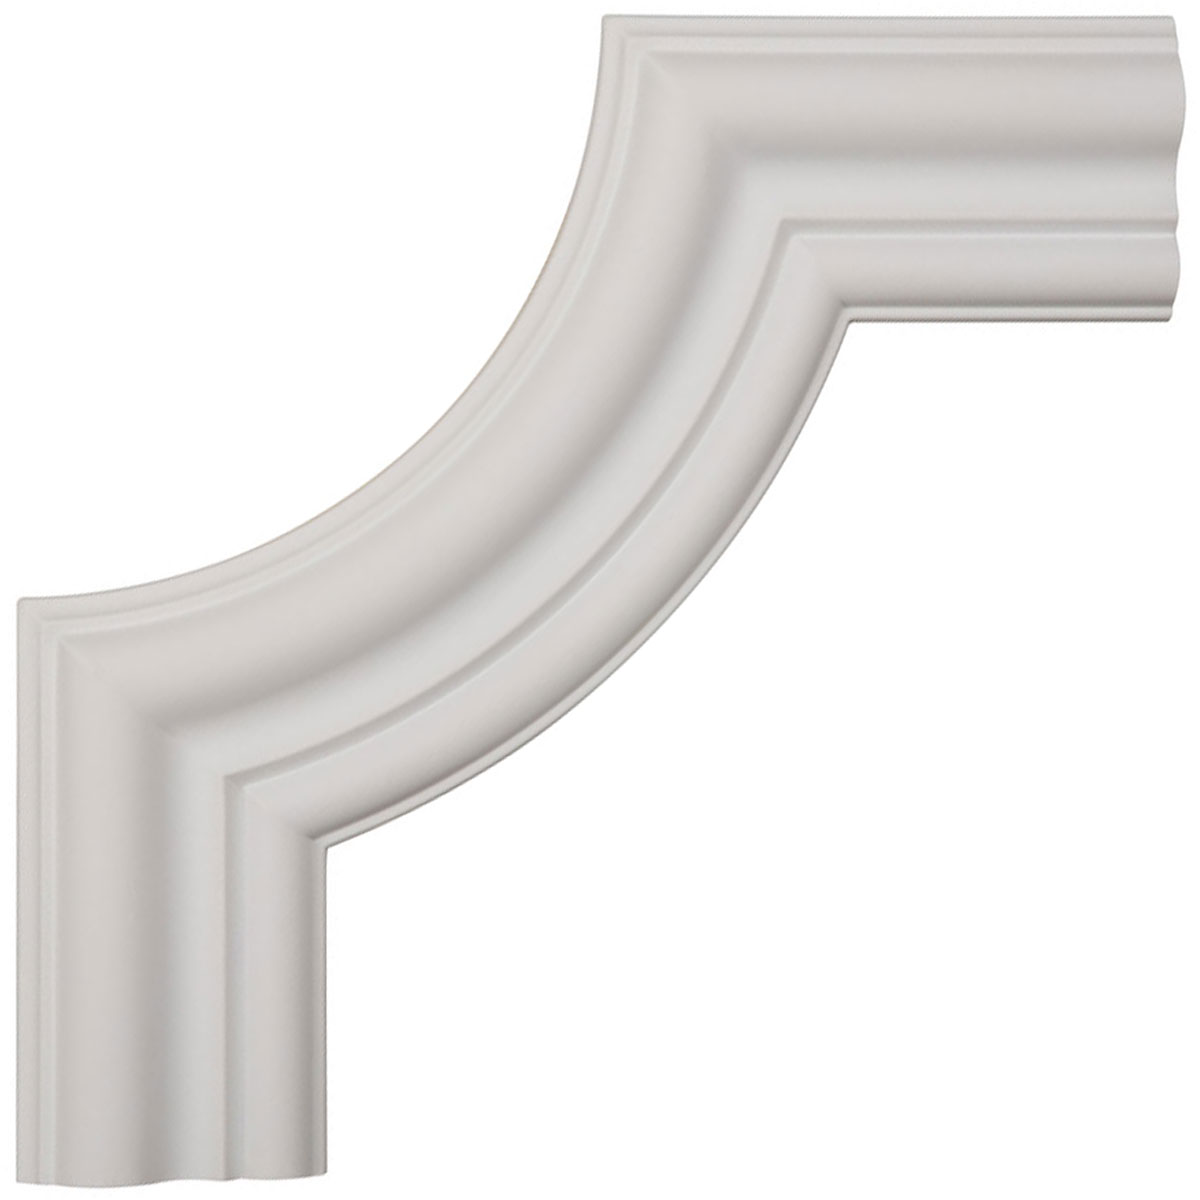 Ekena millwork polyurethane panel moulding corner 12in for Polyurethane millwork